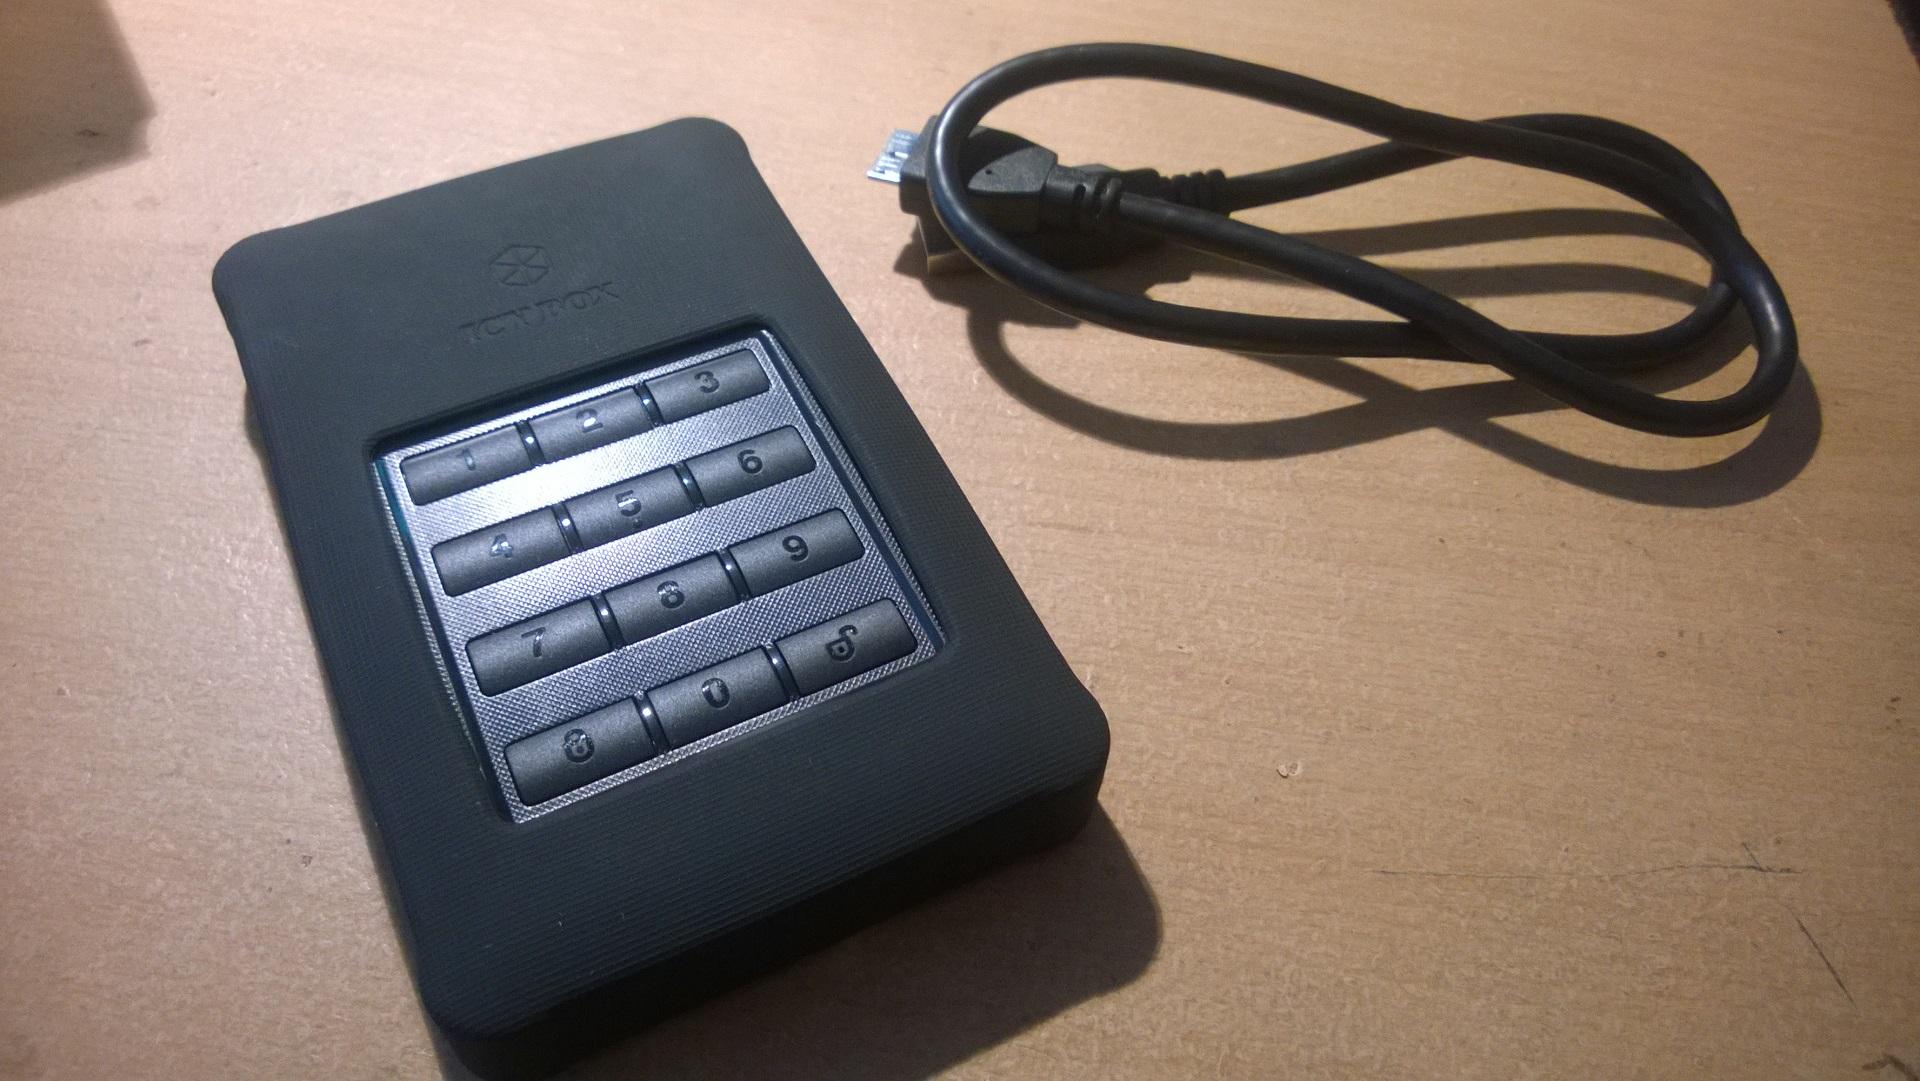 icy box IB-289U3